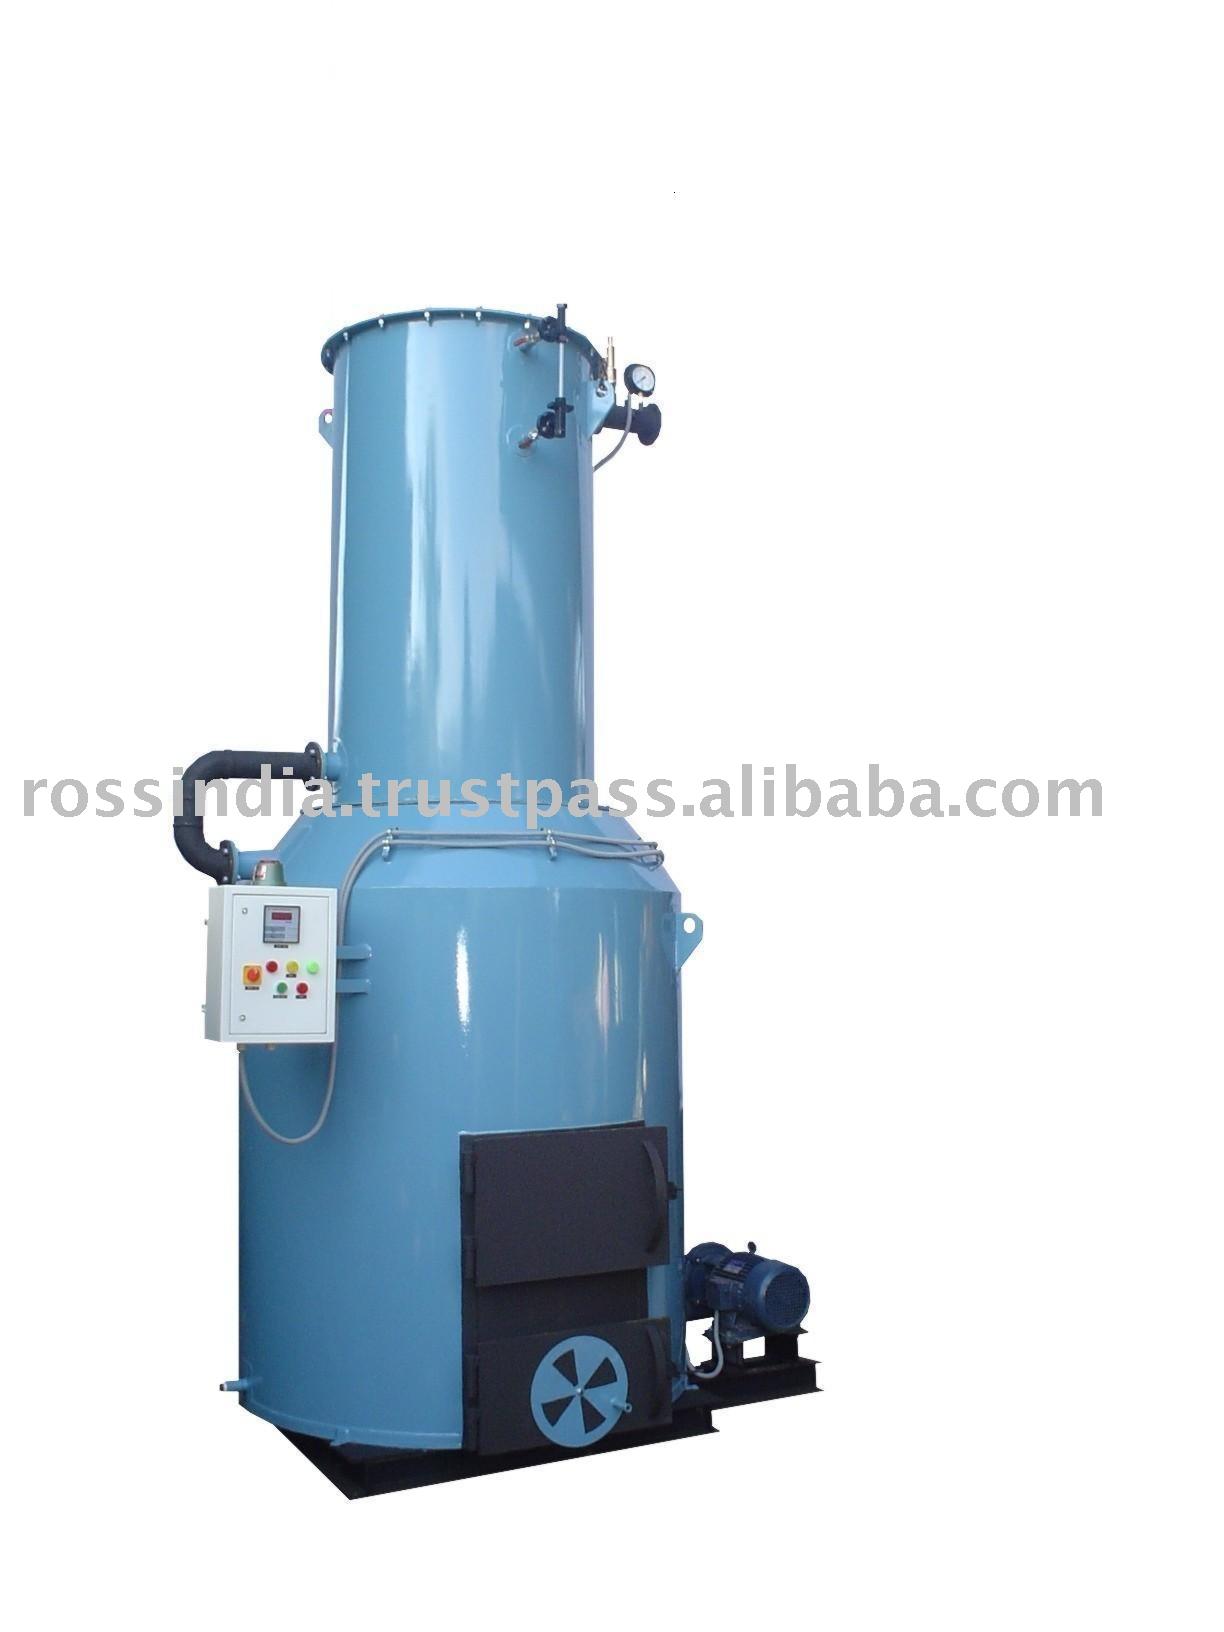 Hot Water Boilers Product ~ Wood fired hot water boilers buy